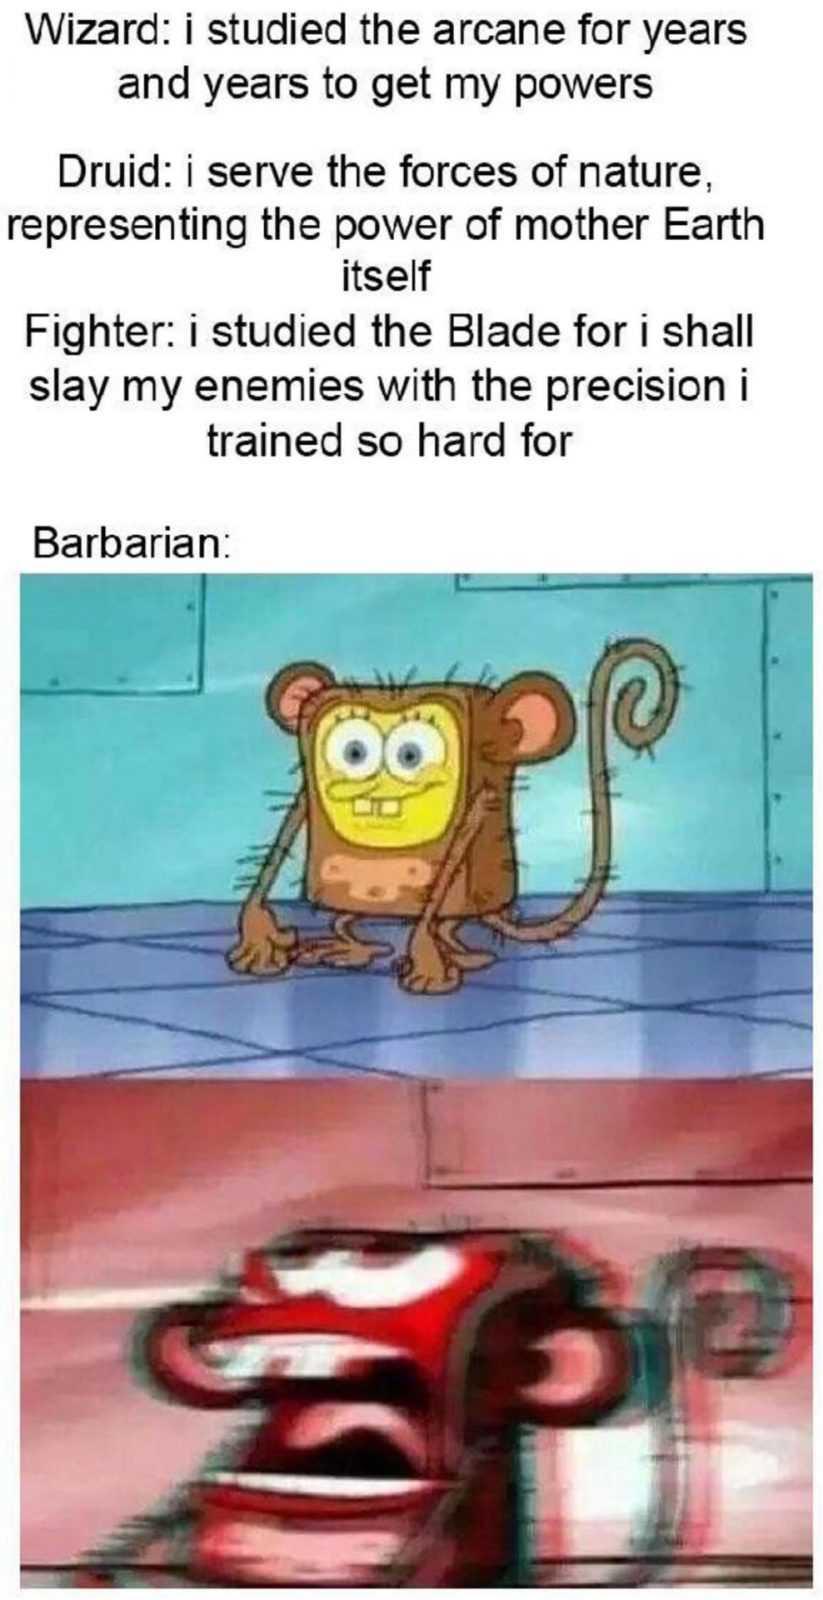 Funny Spongebob memes - barbarian powers